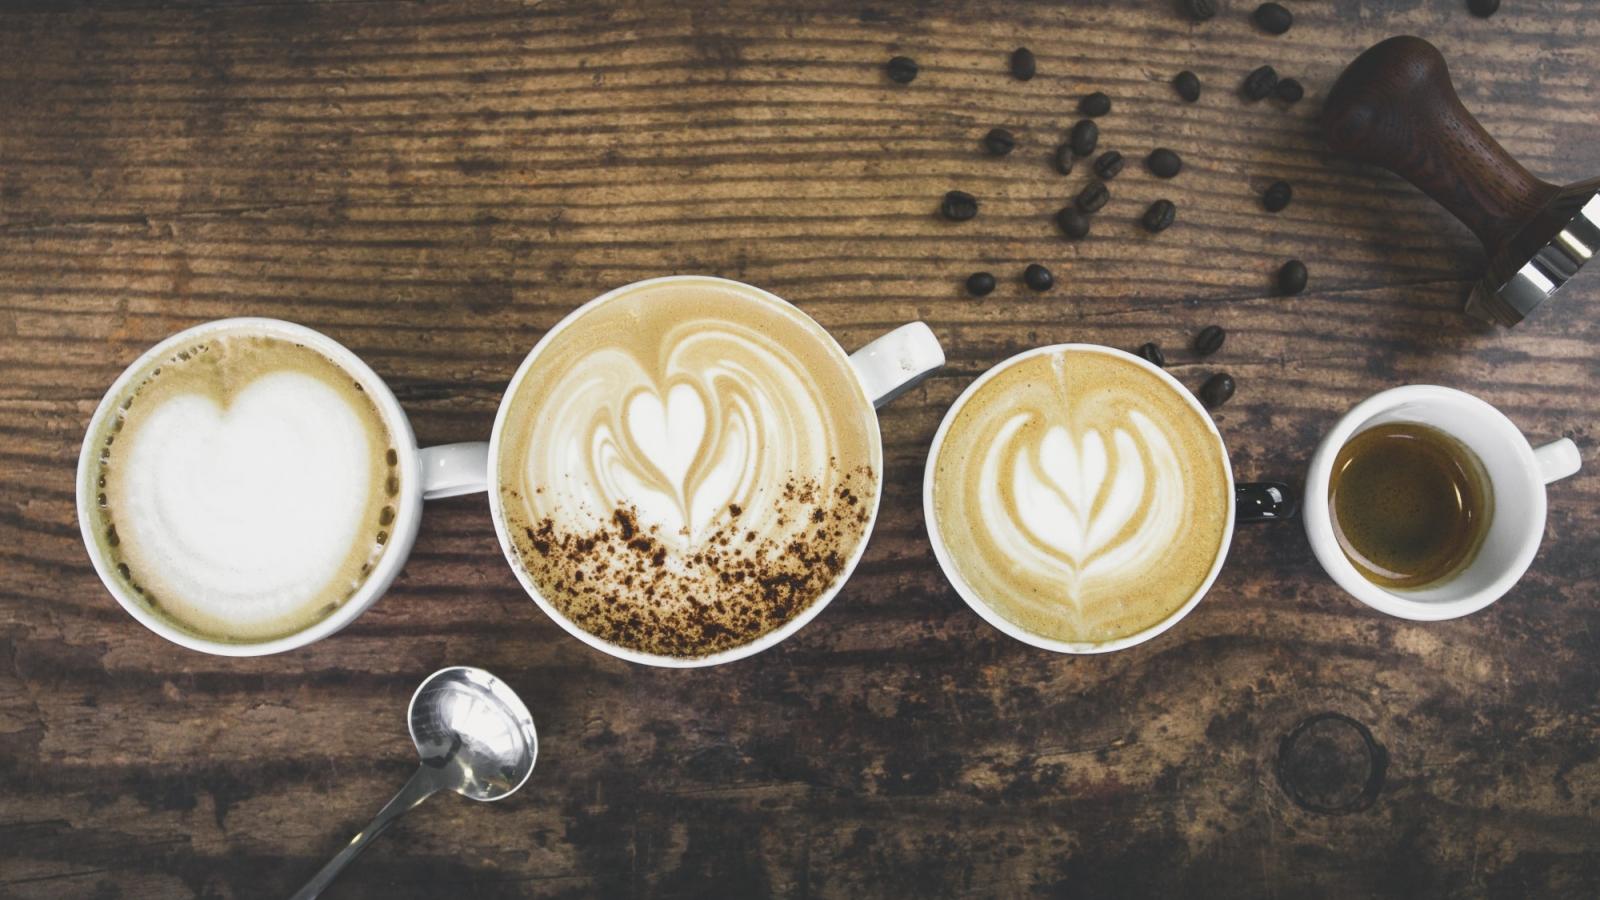 A range of espresso drinks